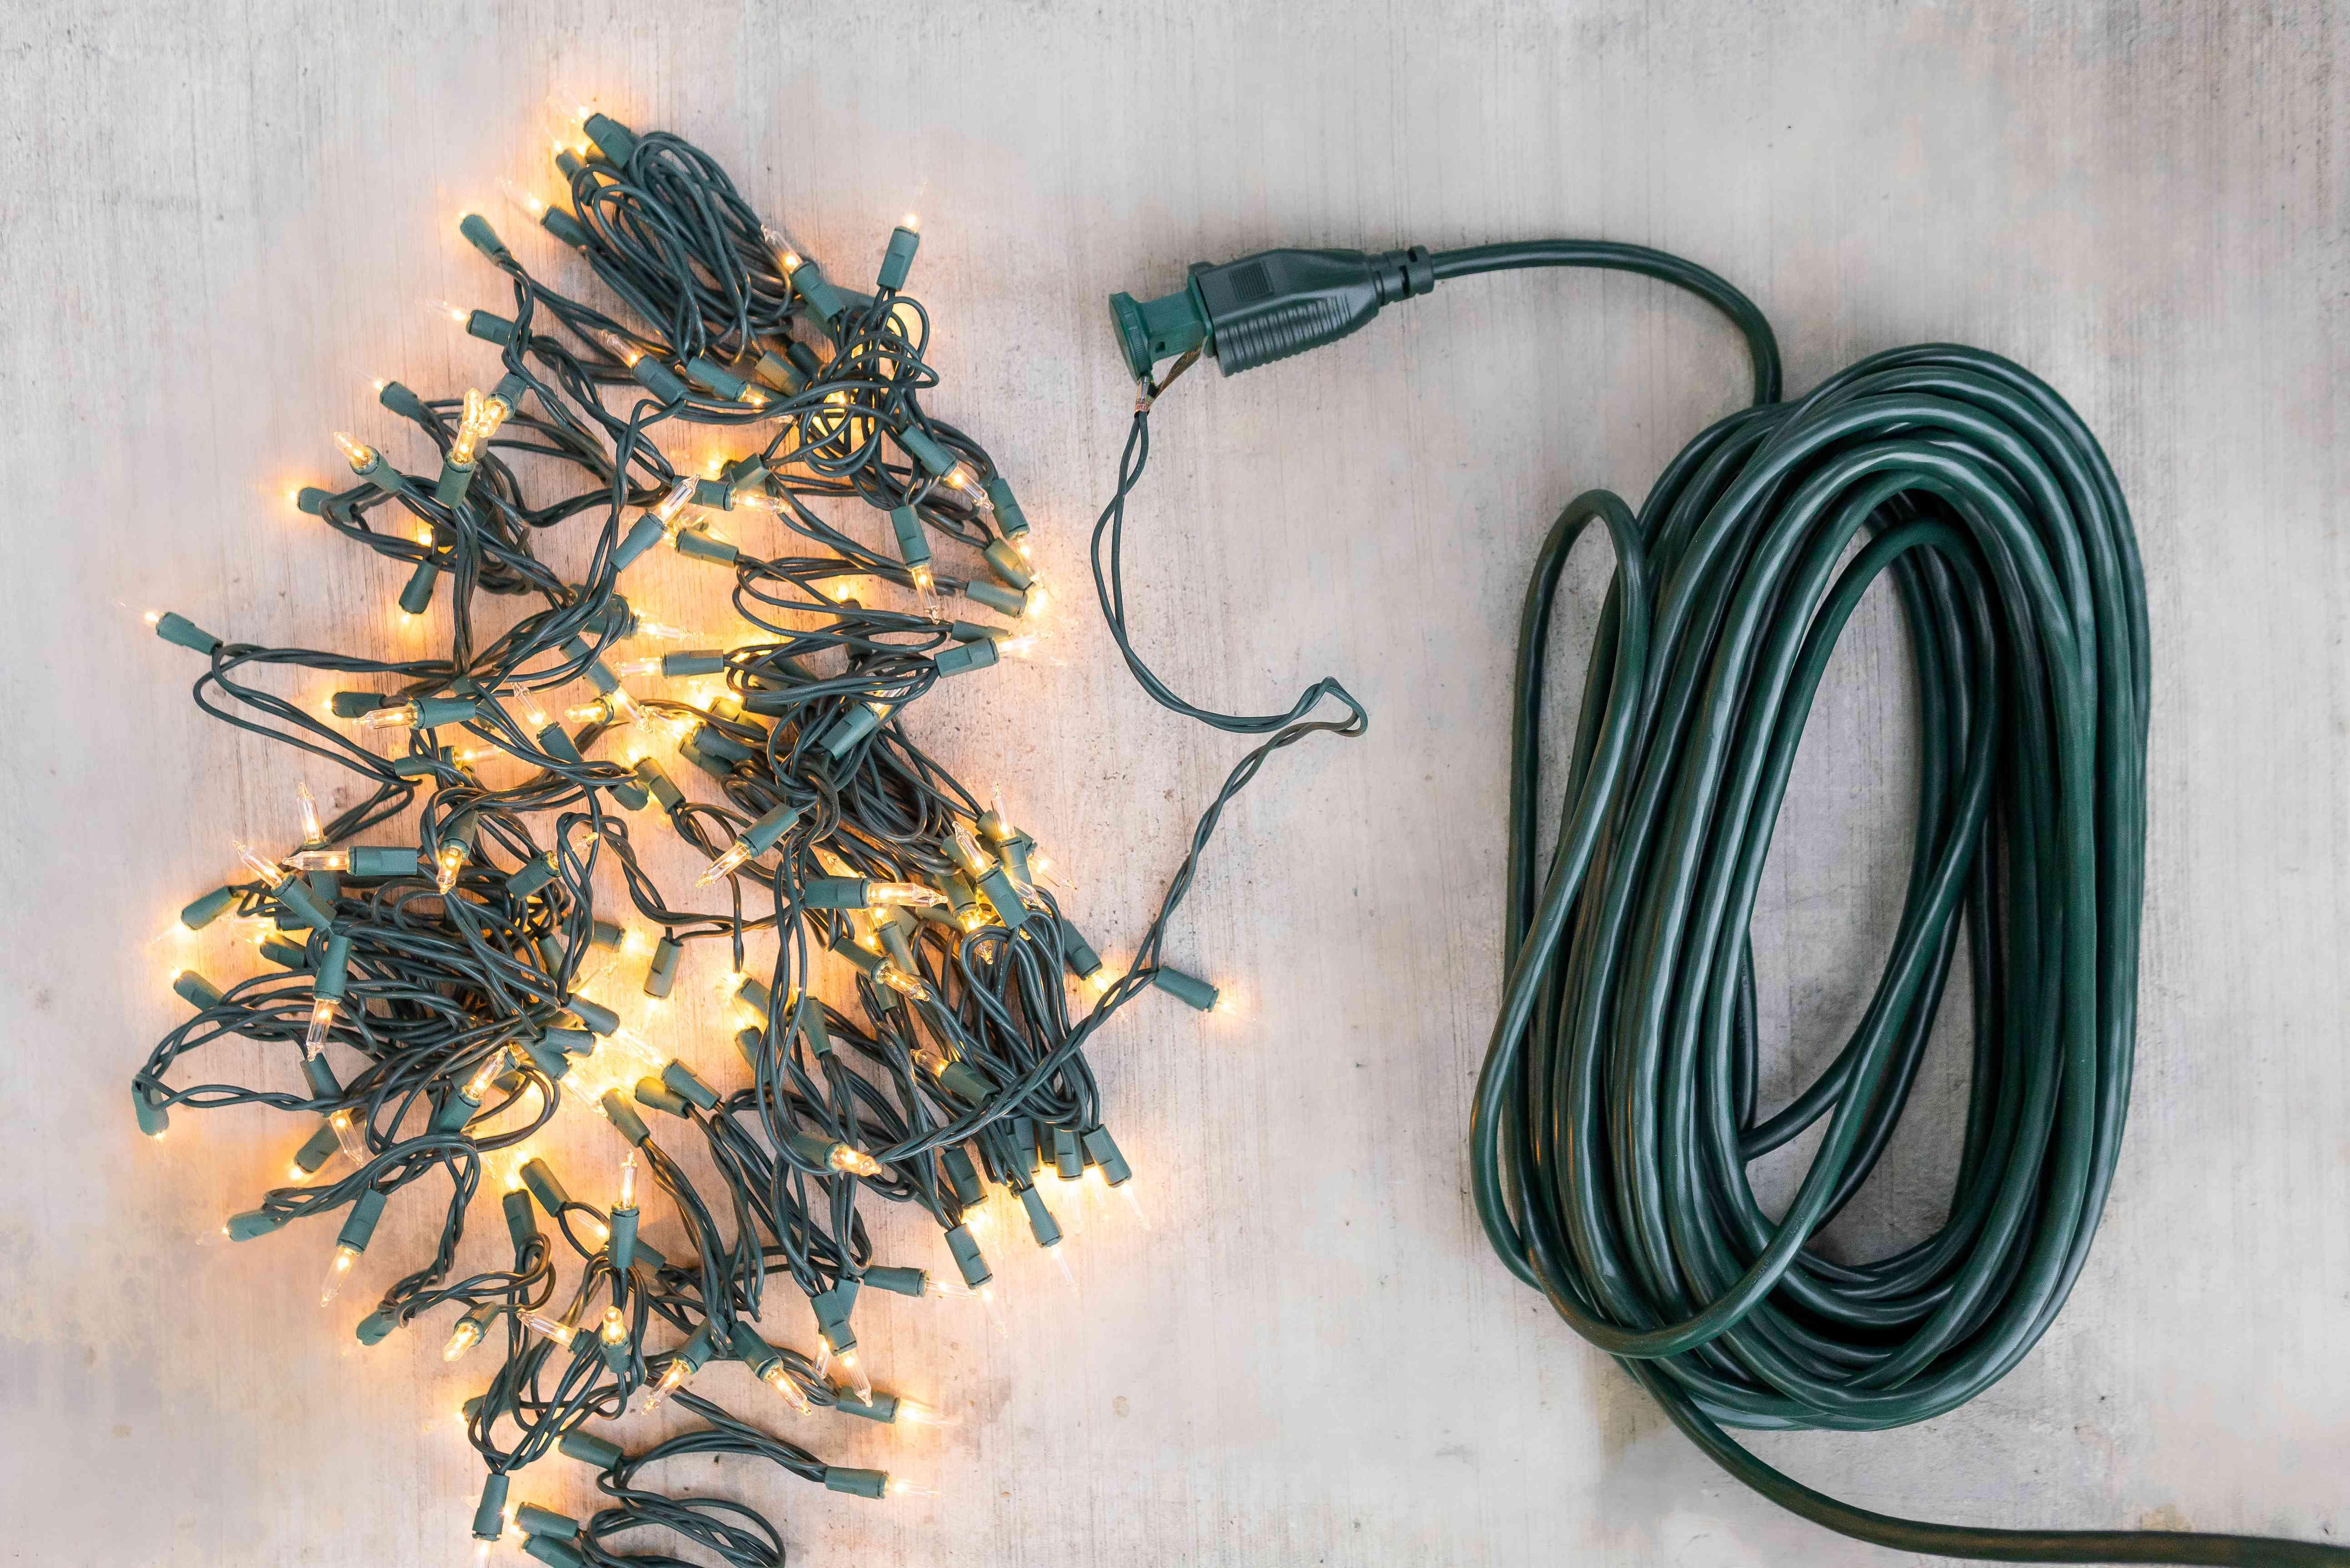 testing the string lights